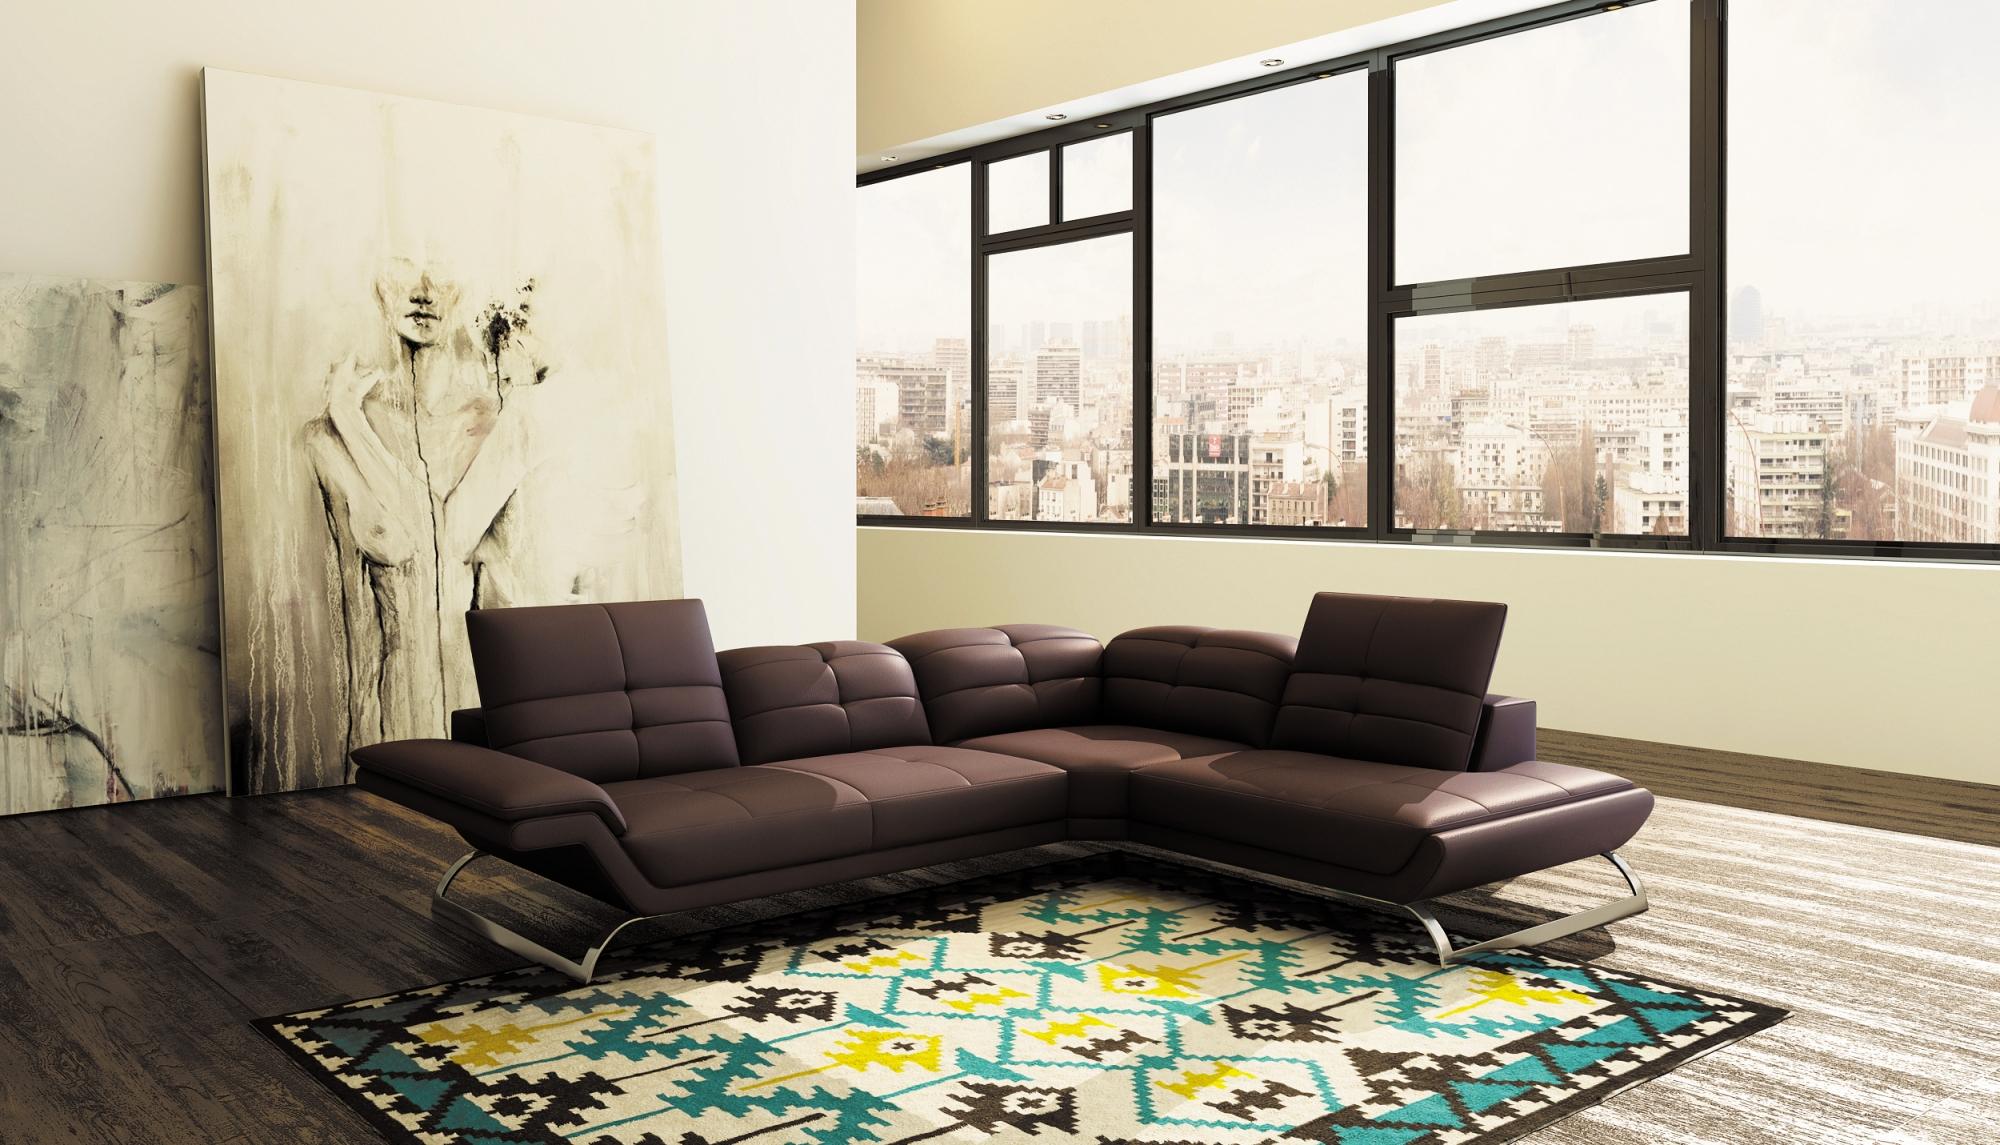 Canape panoramique cuir marron